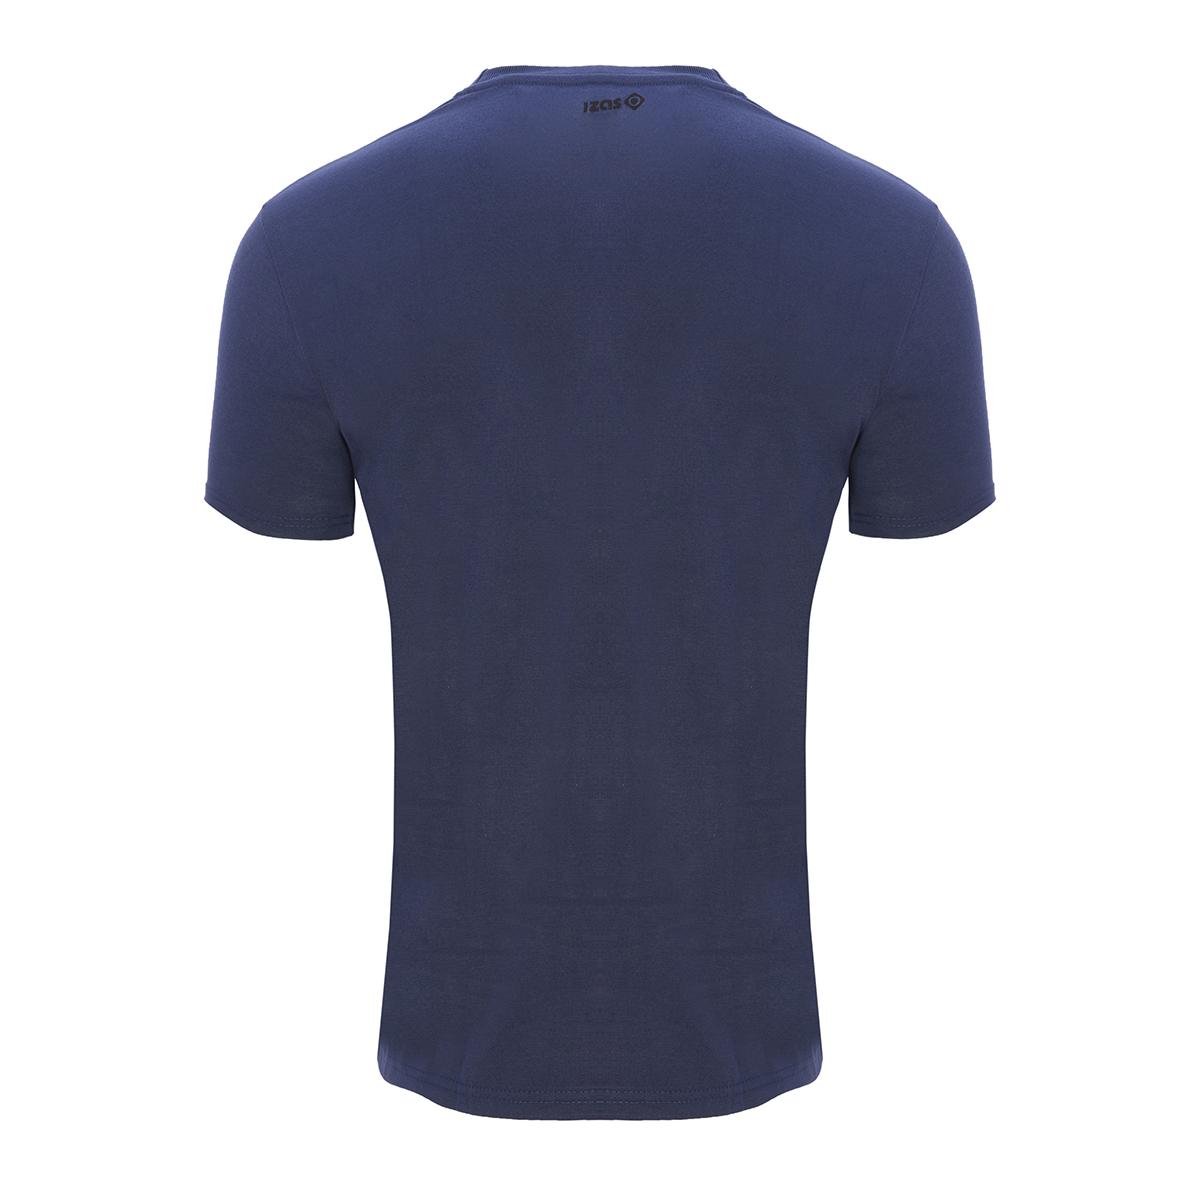 MAN'S AVERY T-SHIRT BLUE